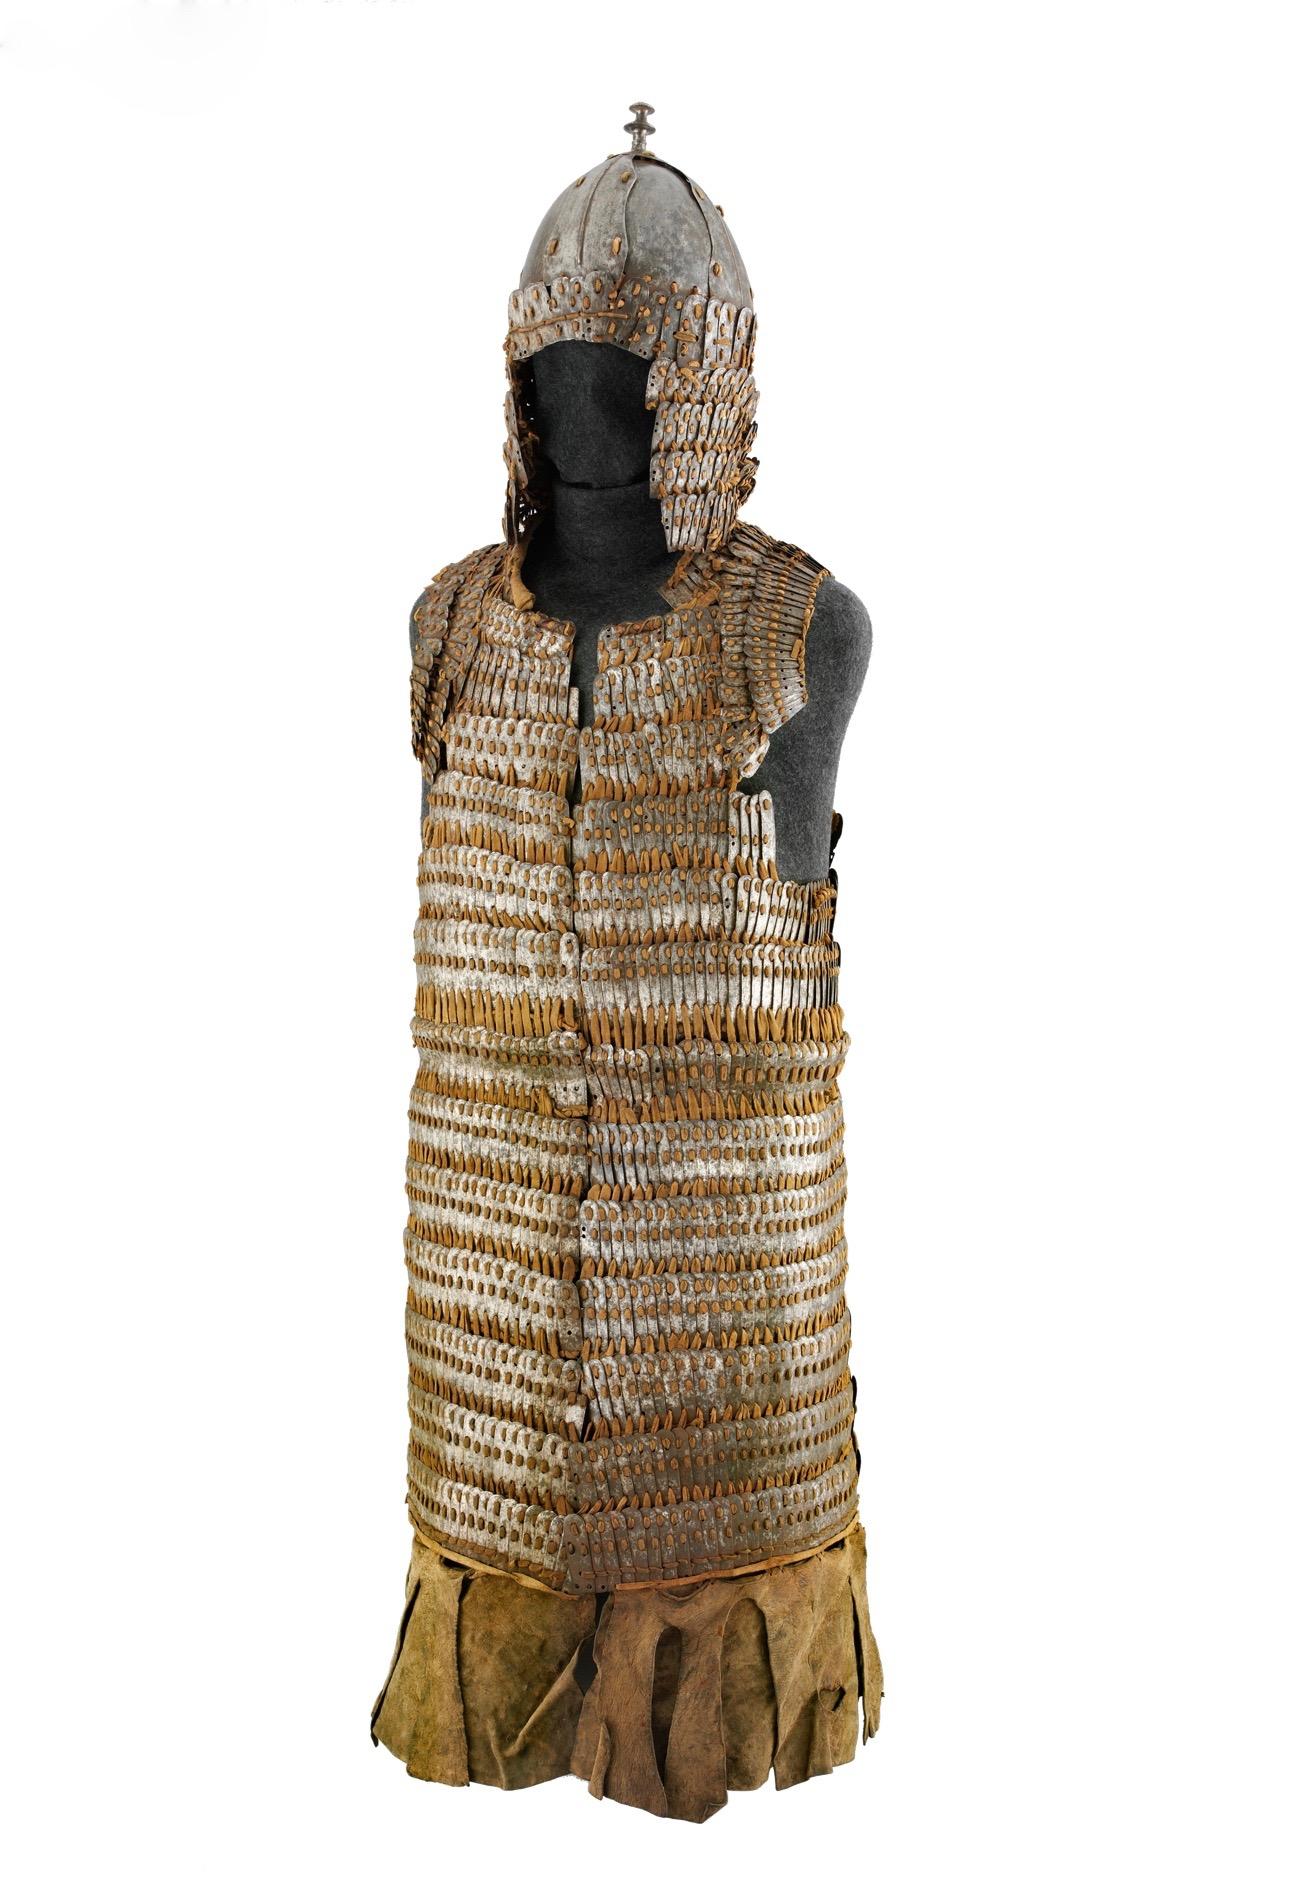 Tibetan lamellar armor with helmet. Metropolitan Museum accession number 36.25.53a, b